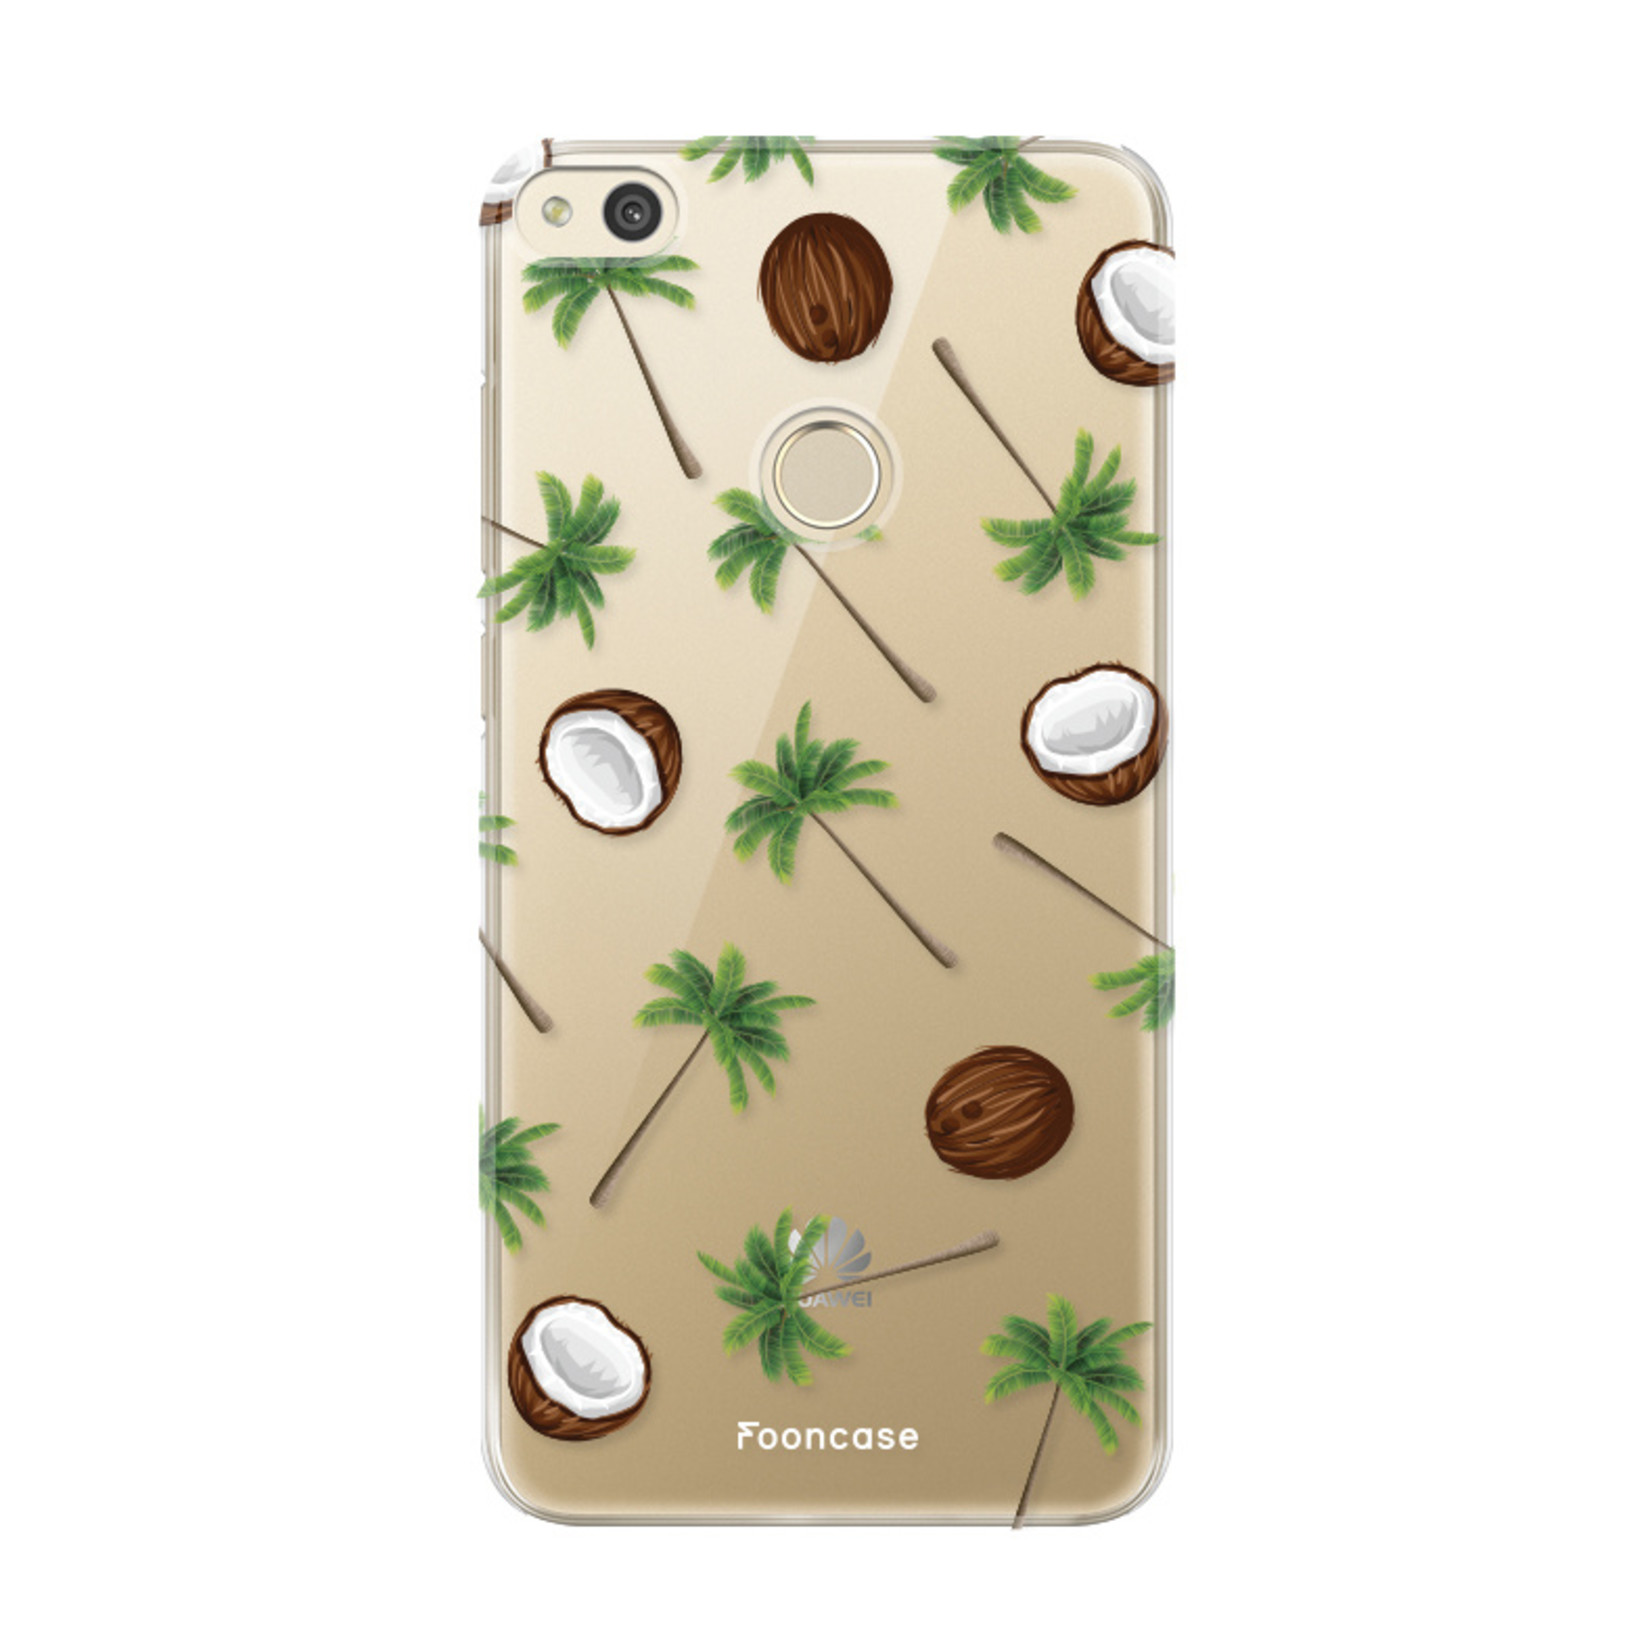 FOONCASE Huawei P8 Lite 2017 Handyhülle - Coco Paradise